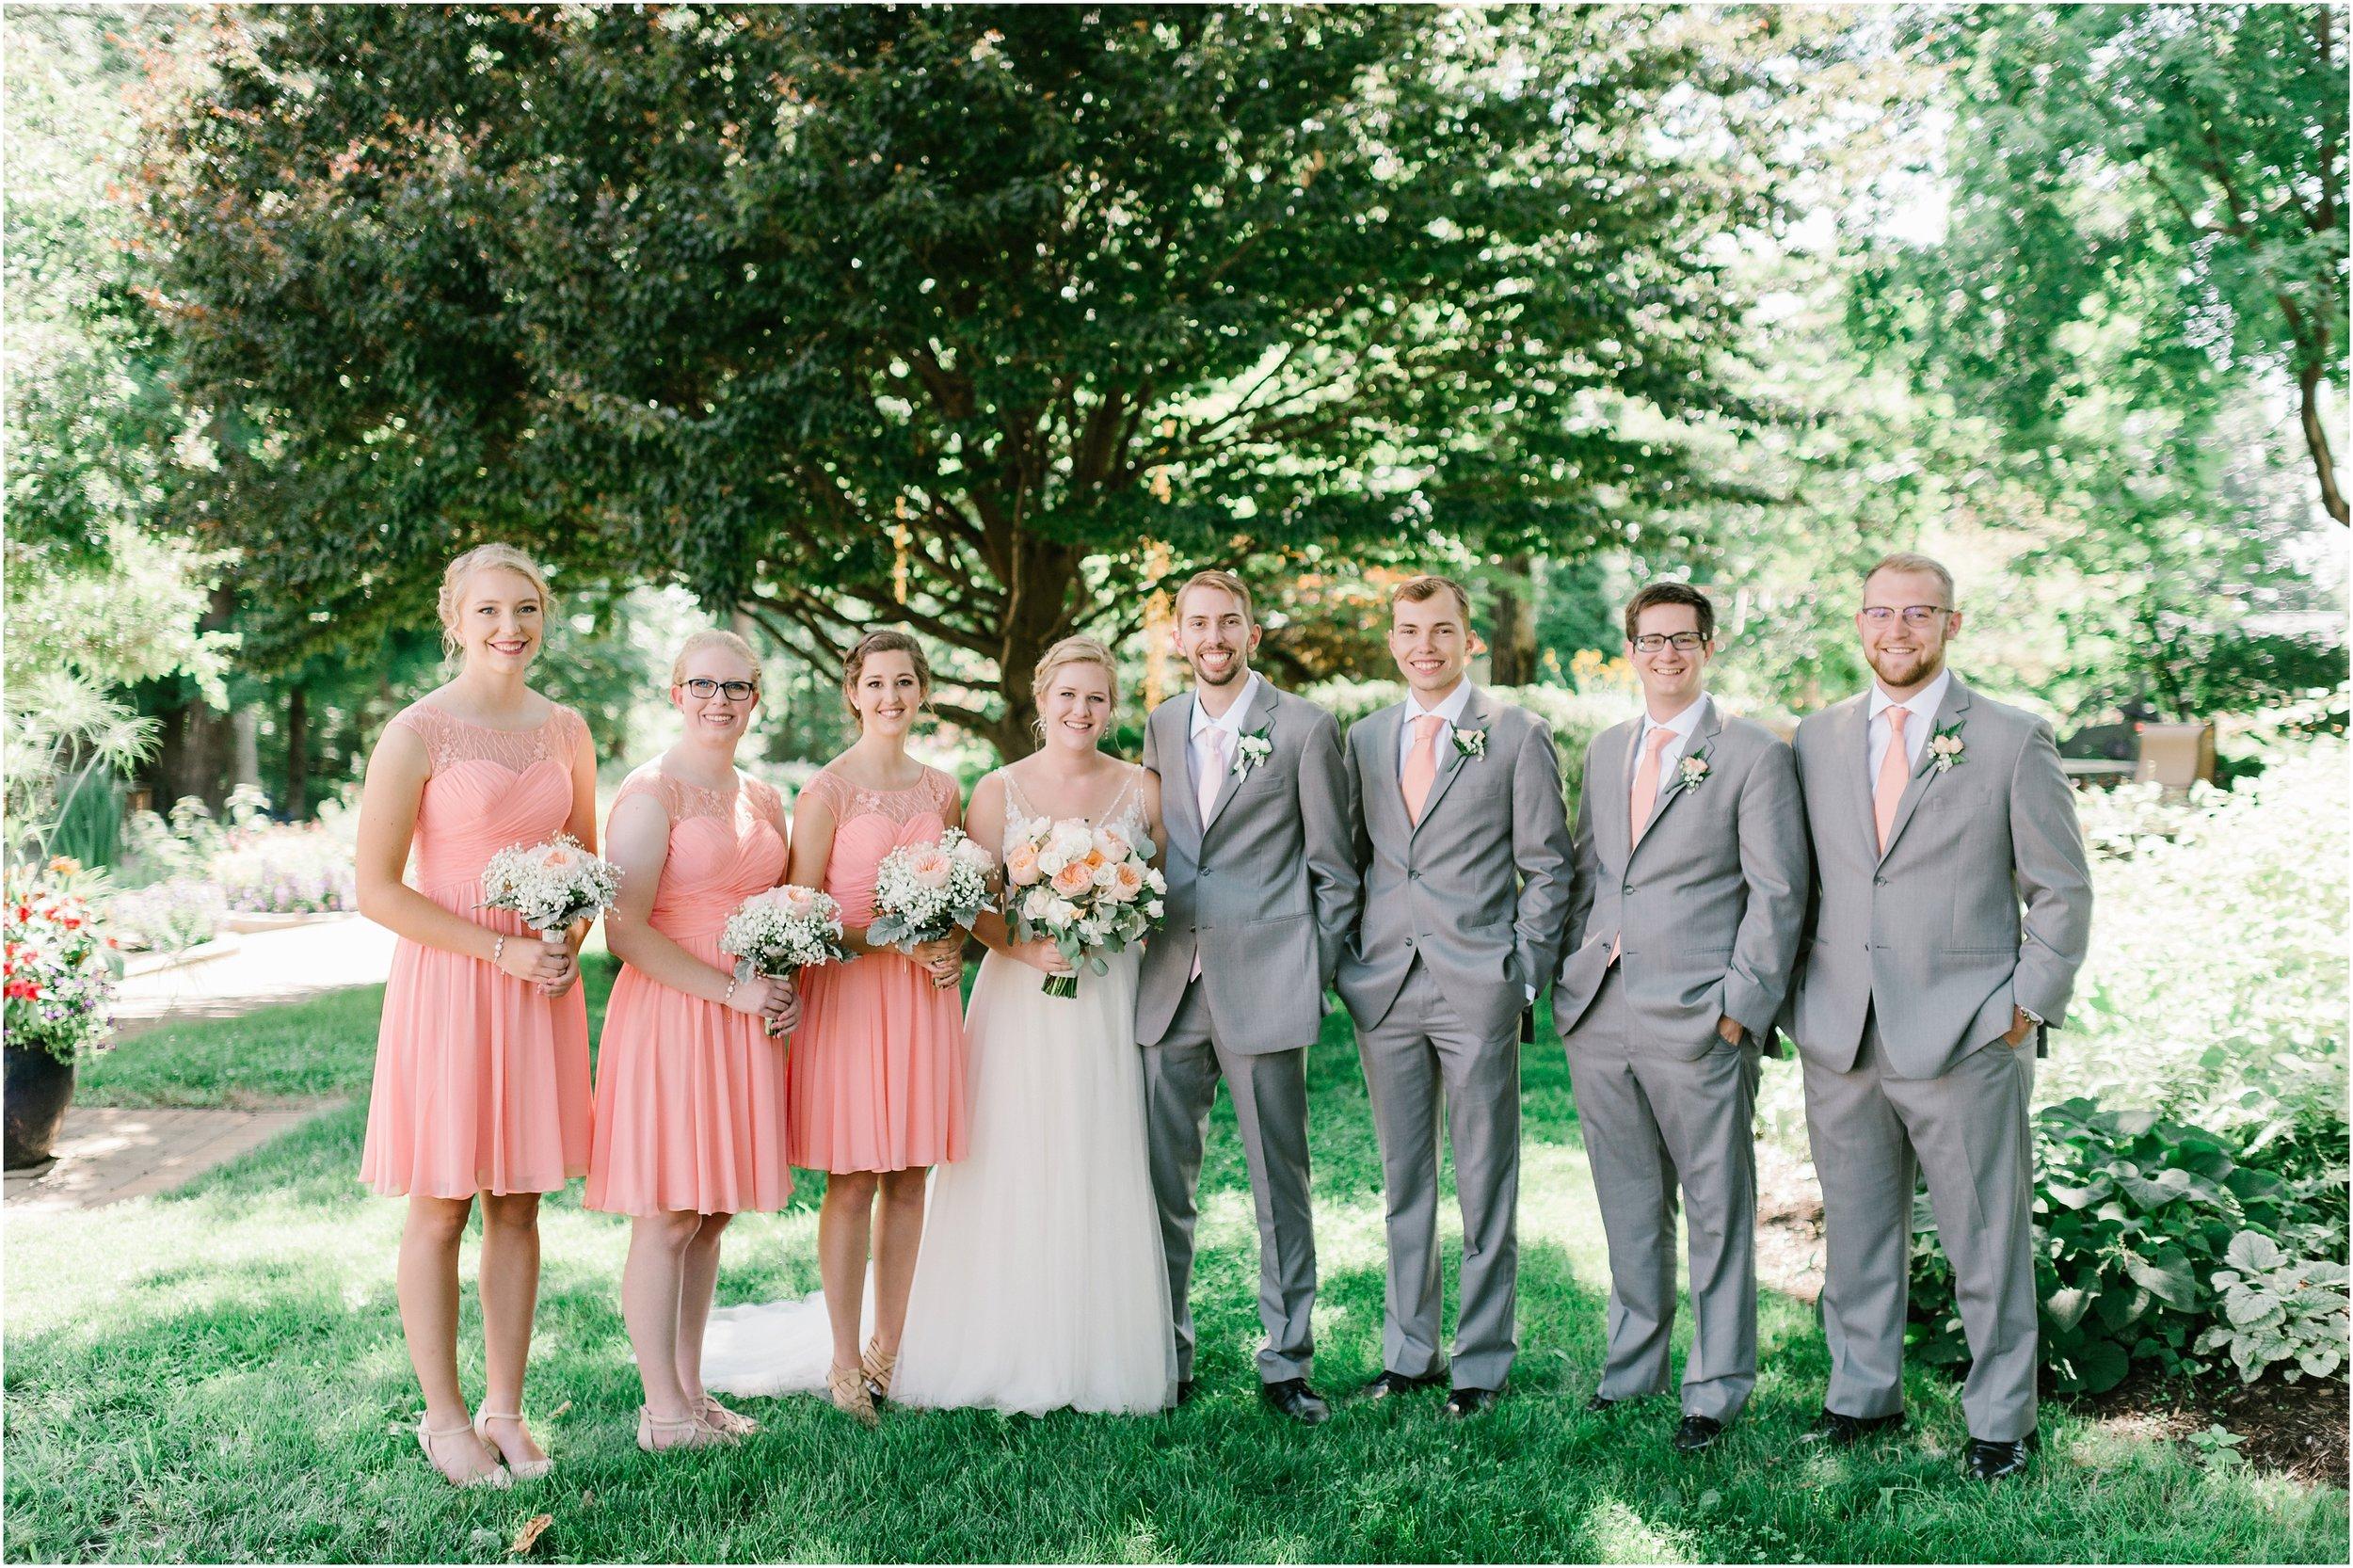 Rebecca_Shehorn_Photography_Indianapolis_Wedding_Photographer_8487.jpg